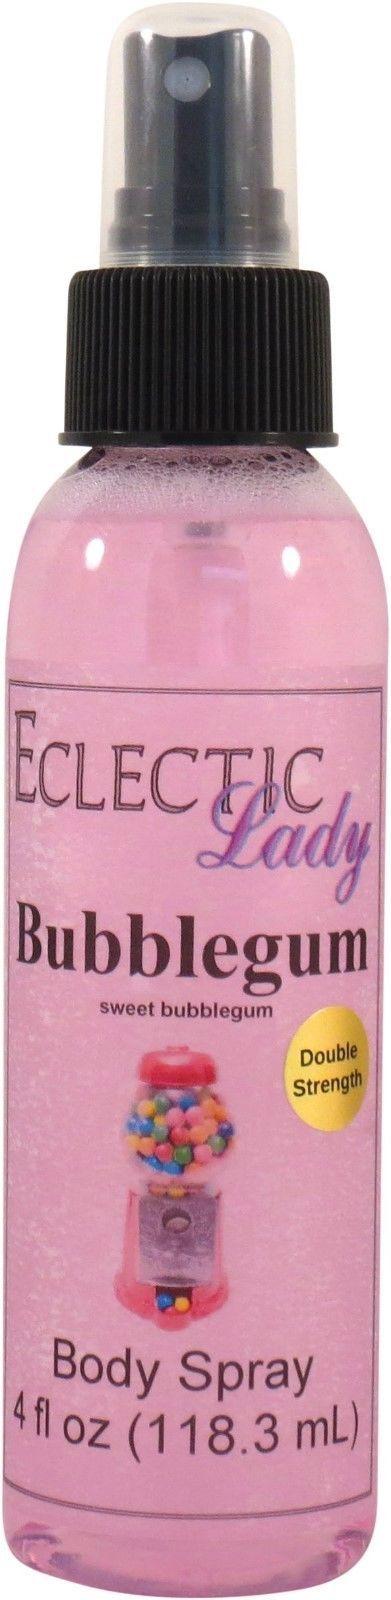 Bubblegum Body Spray